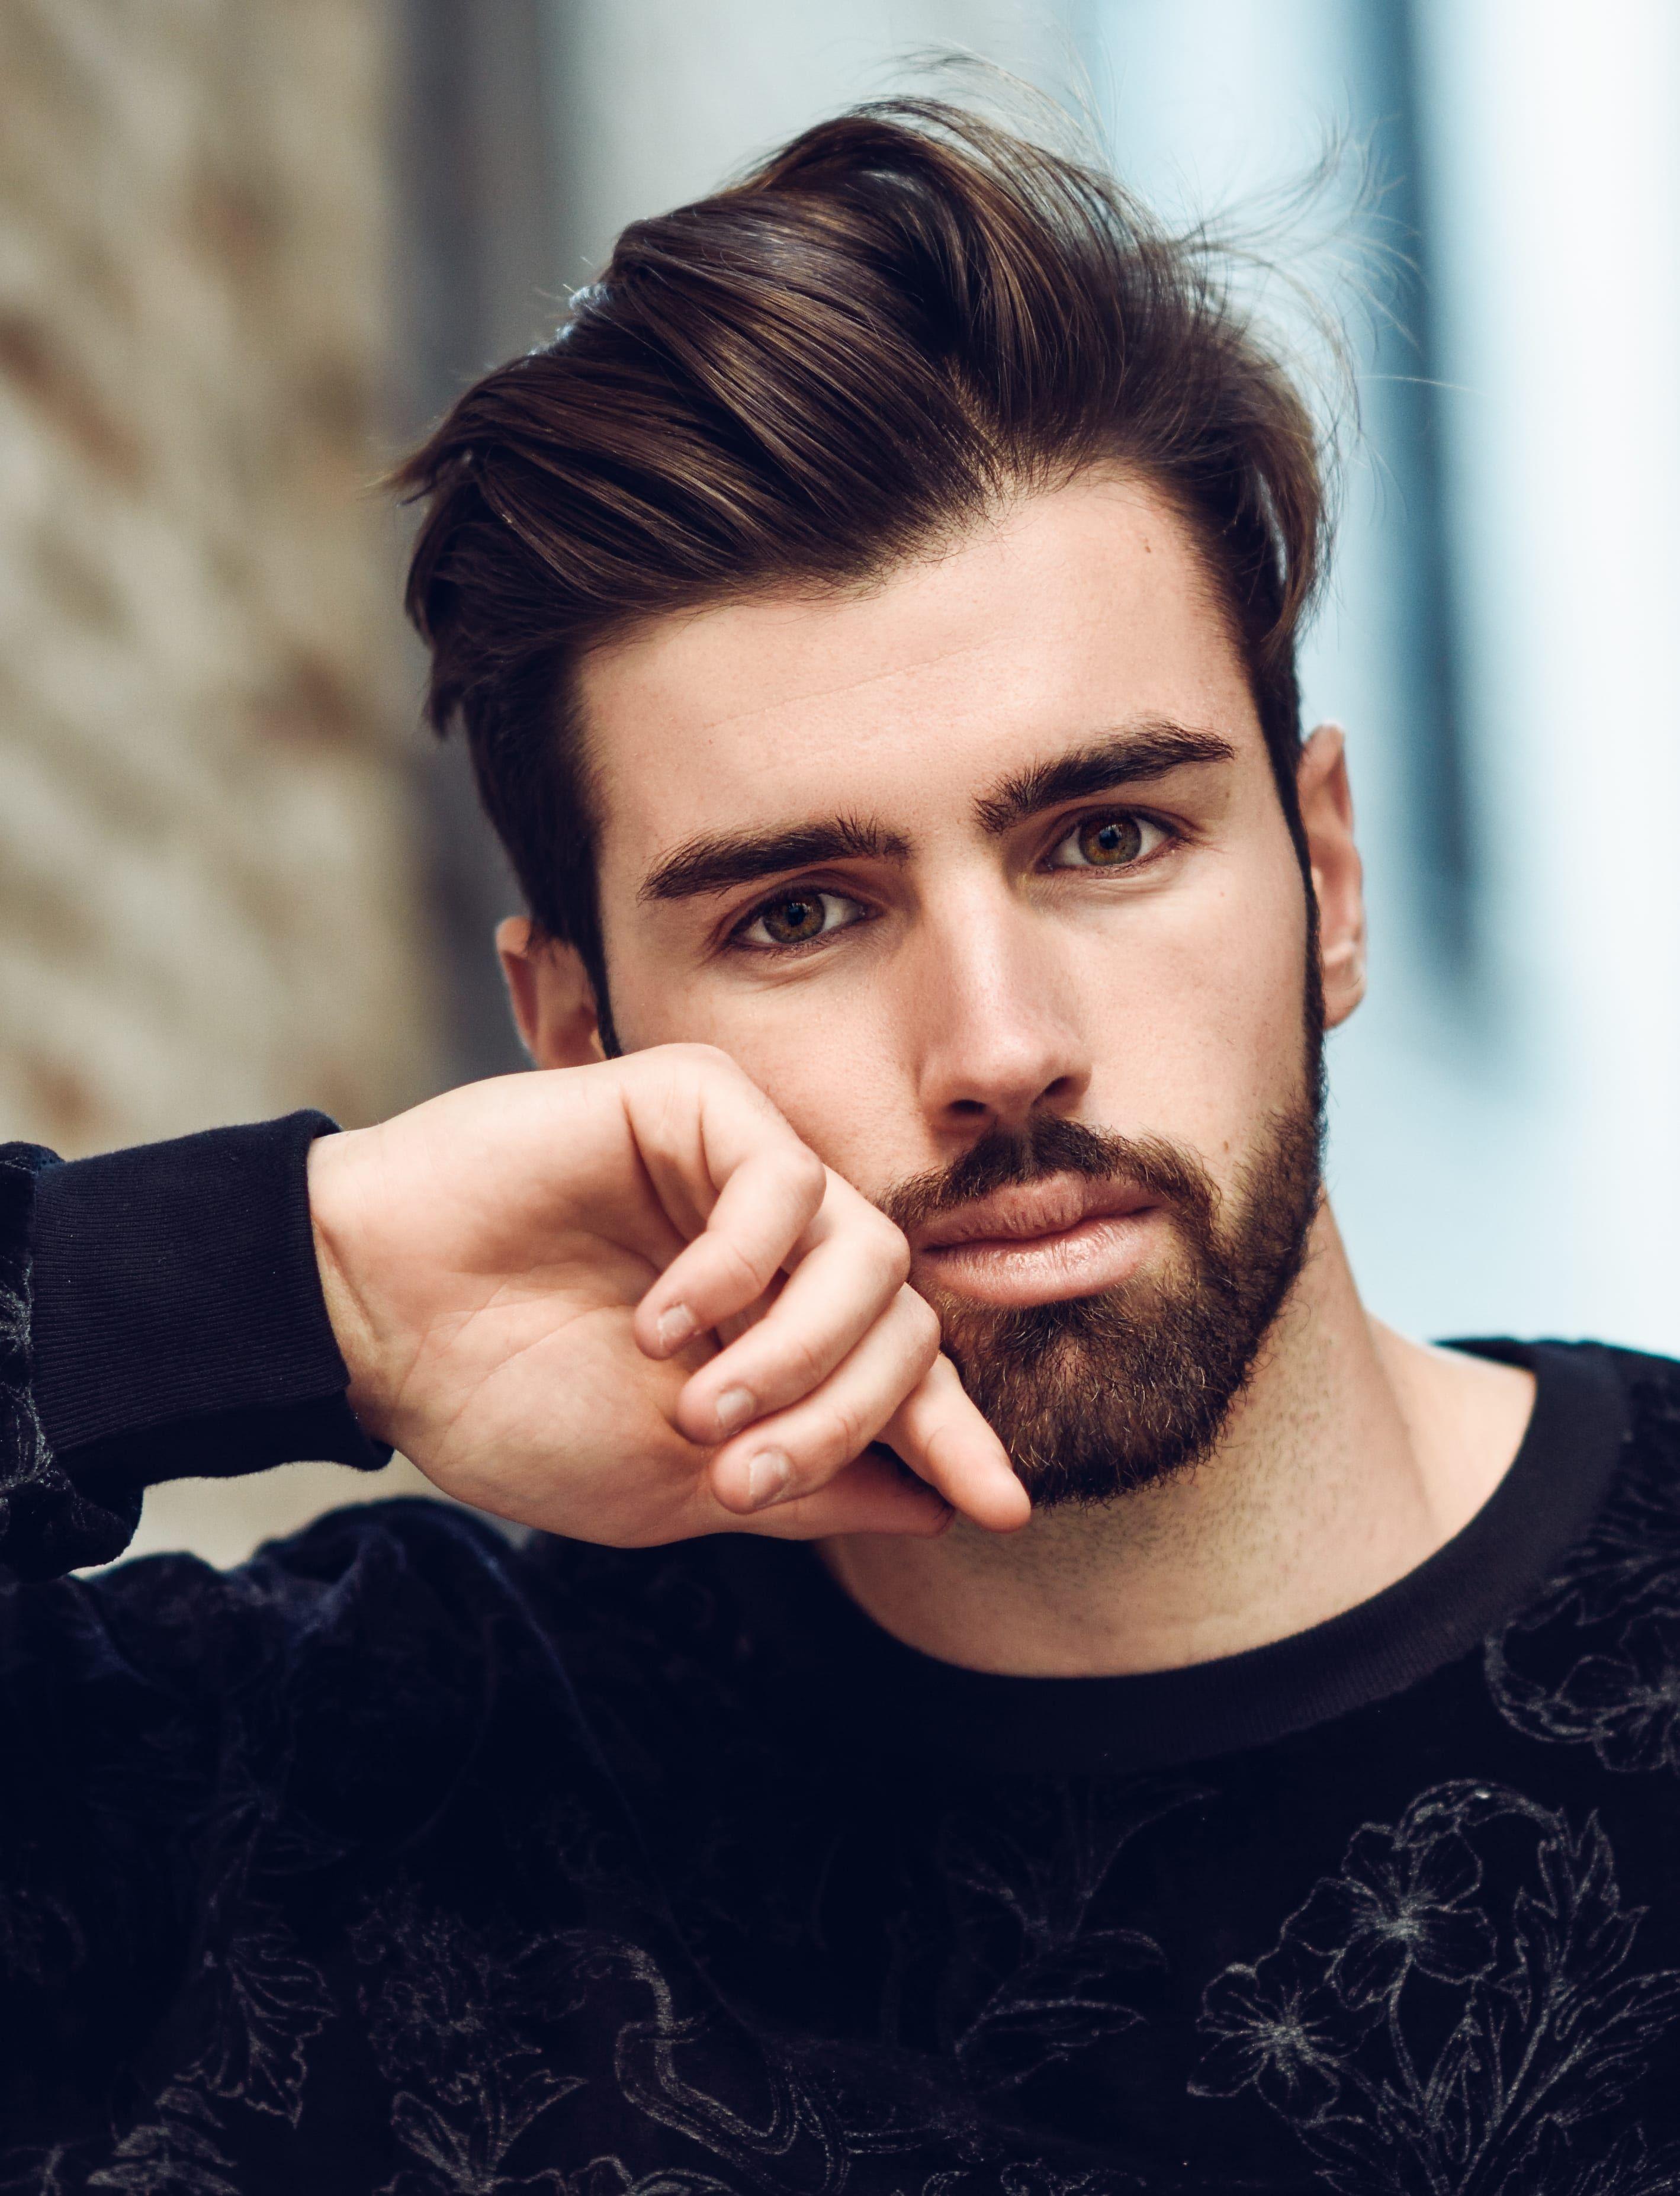 100 Trending Haircuts For Men Haircuts For 2020 Haircut Inspiration In 2020 Haircuts For Men Mens Hairstyles Short Mens Haircuts Short